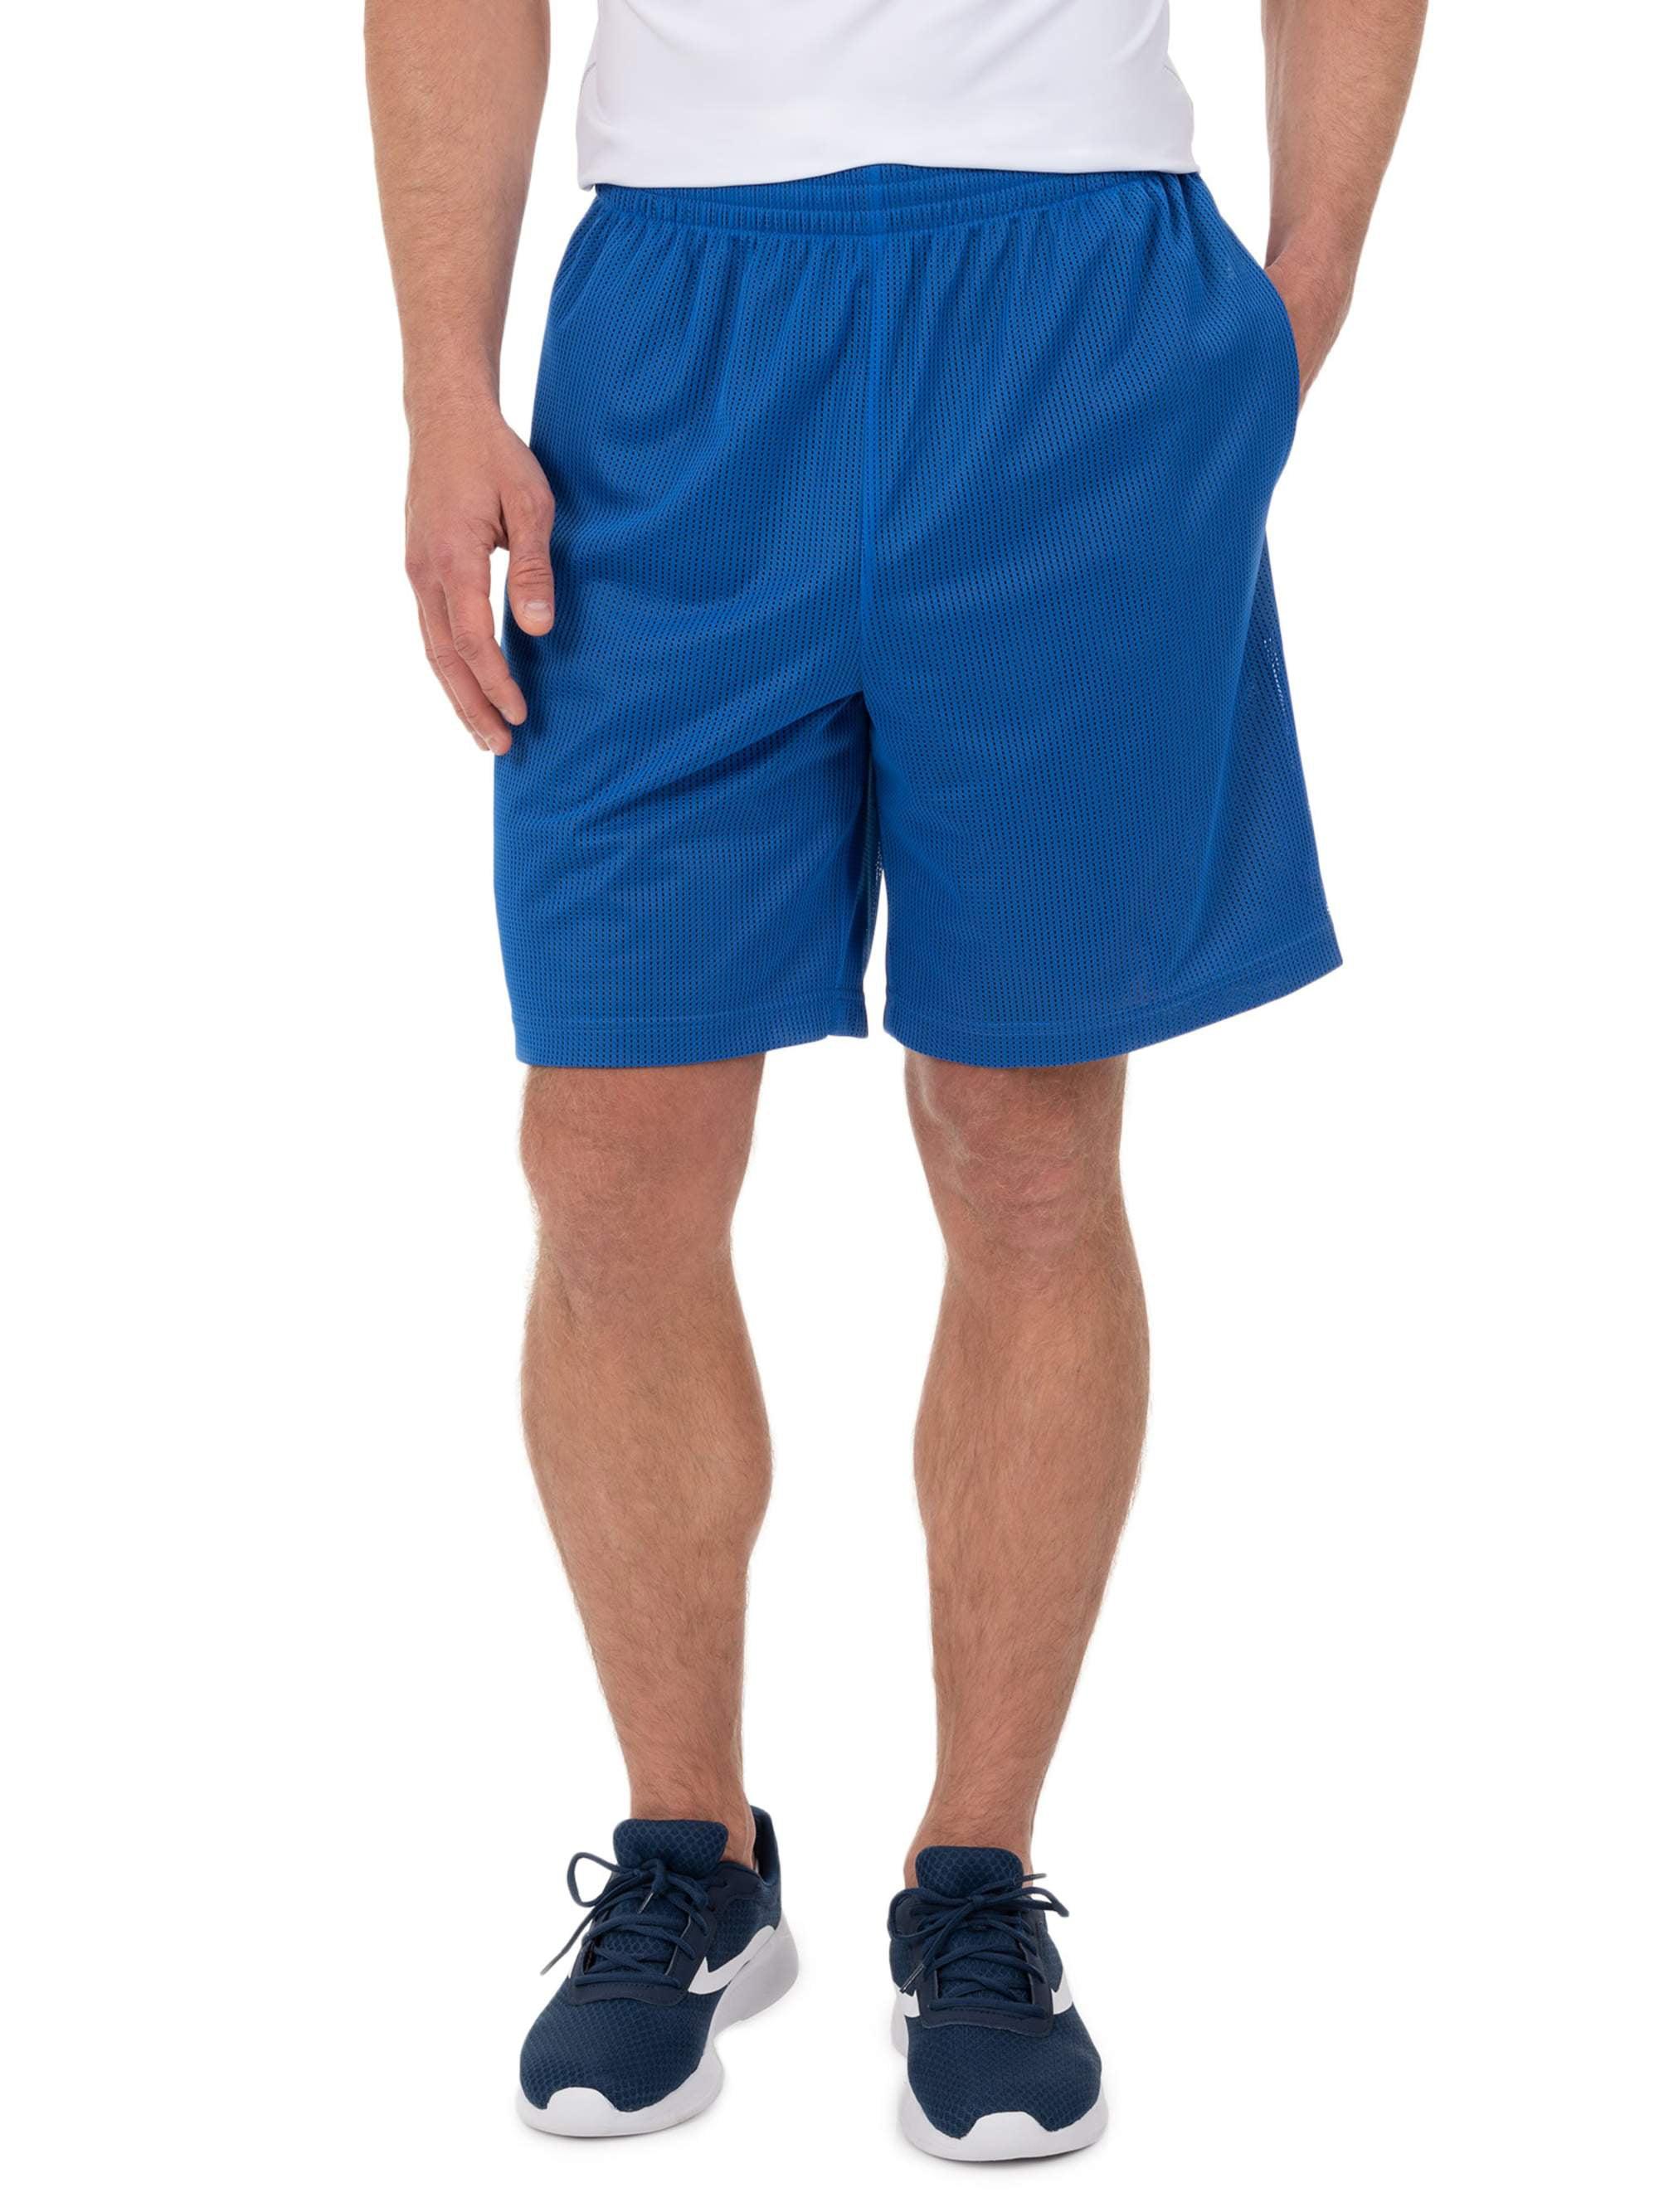 Men's Athletic Works Active Performance Grid Mesh Short